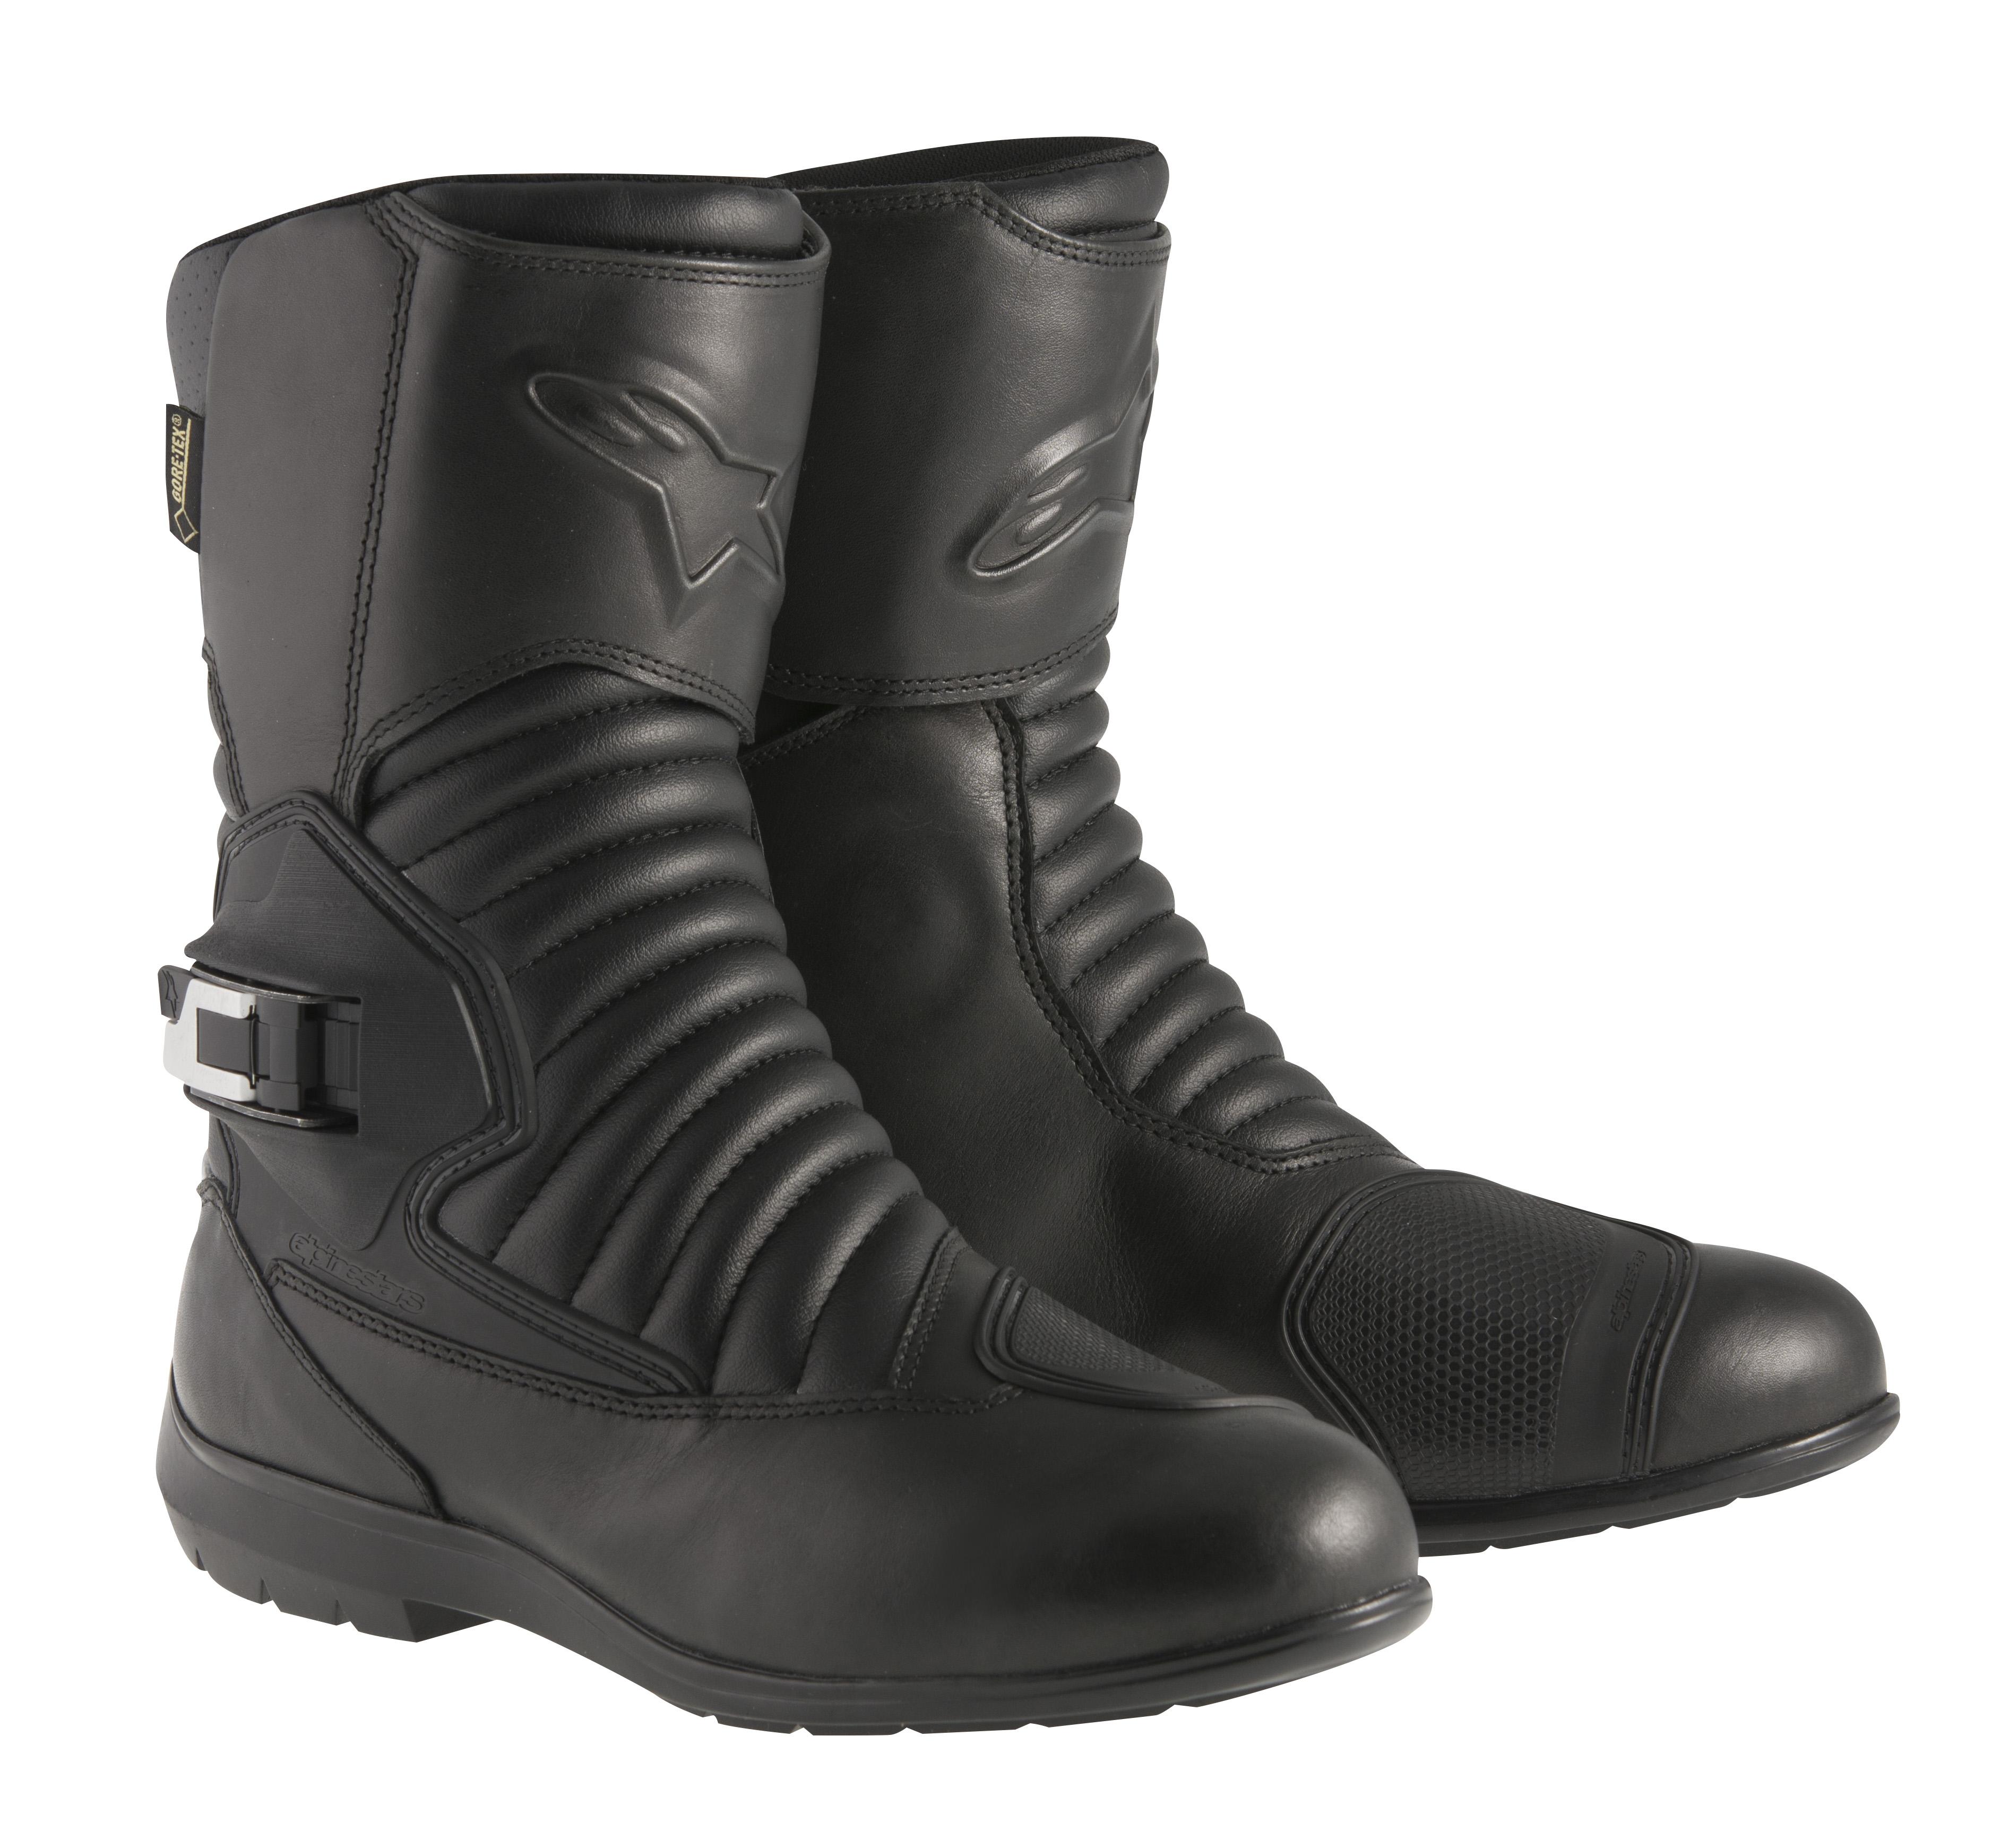 Alpine stars MonoFuse Gore-Tex Touring Boot Black